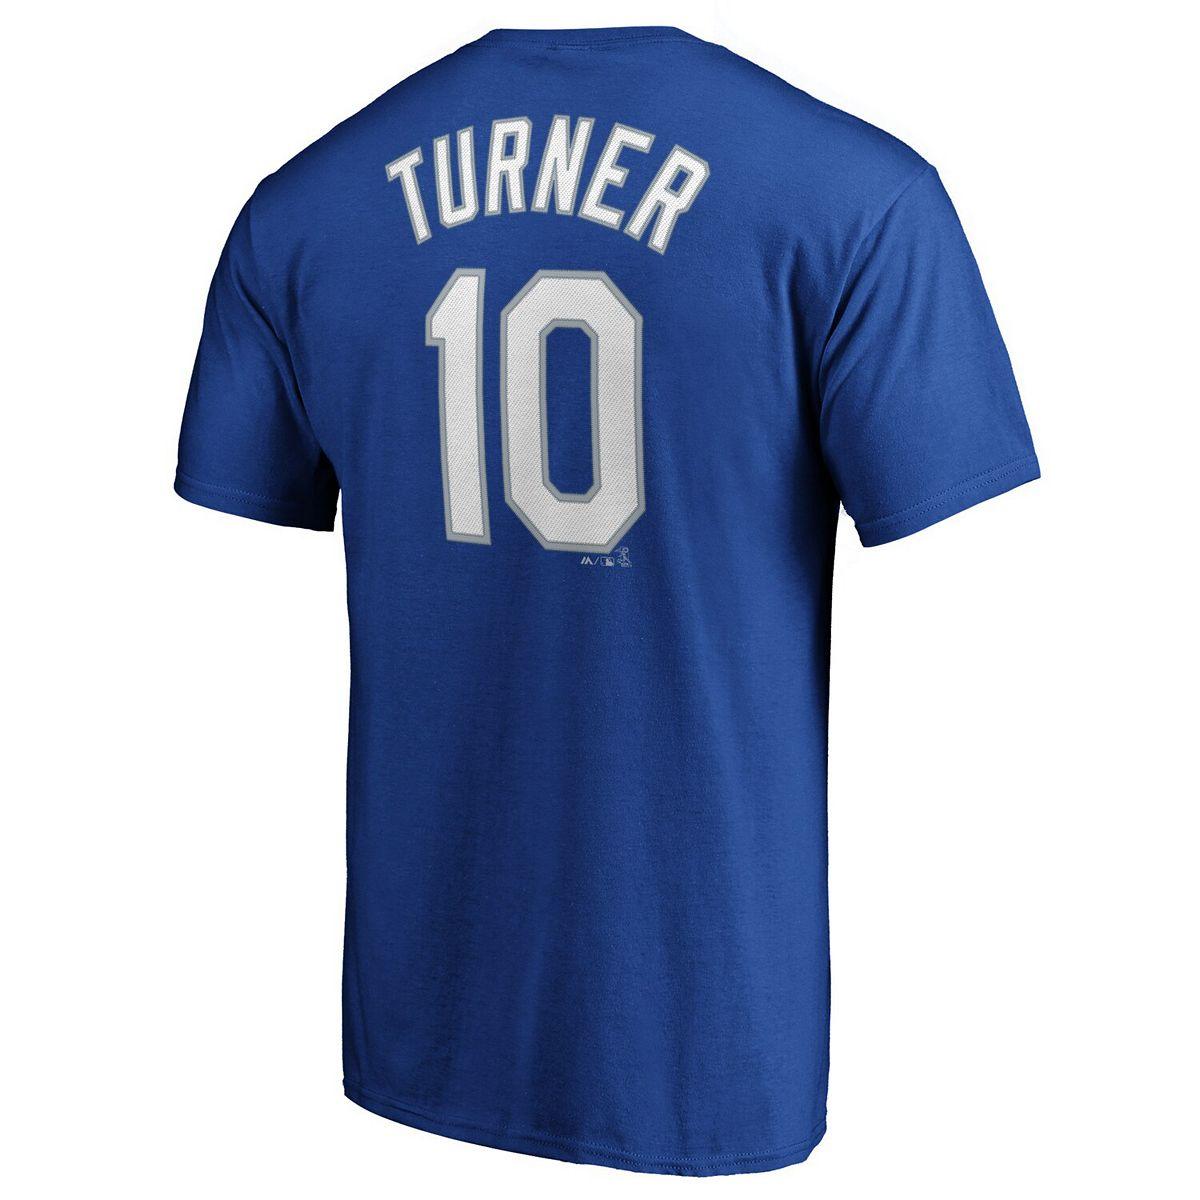 Justin Turner Los Angeles Dodgers Majestic Team Official Name & Number T-Shirt - Royal Yv856